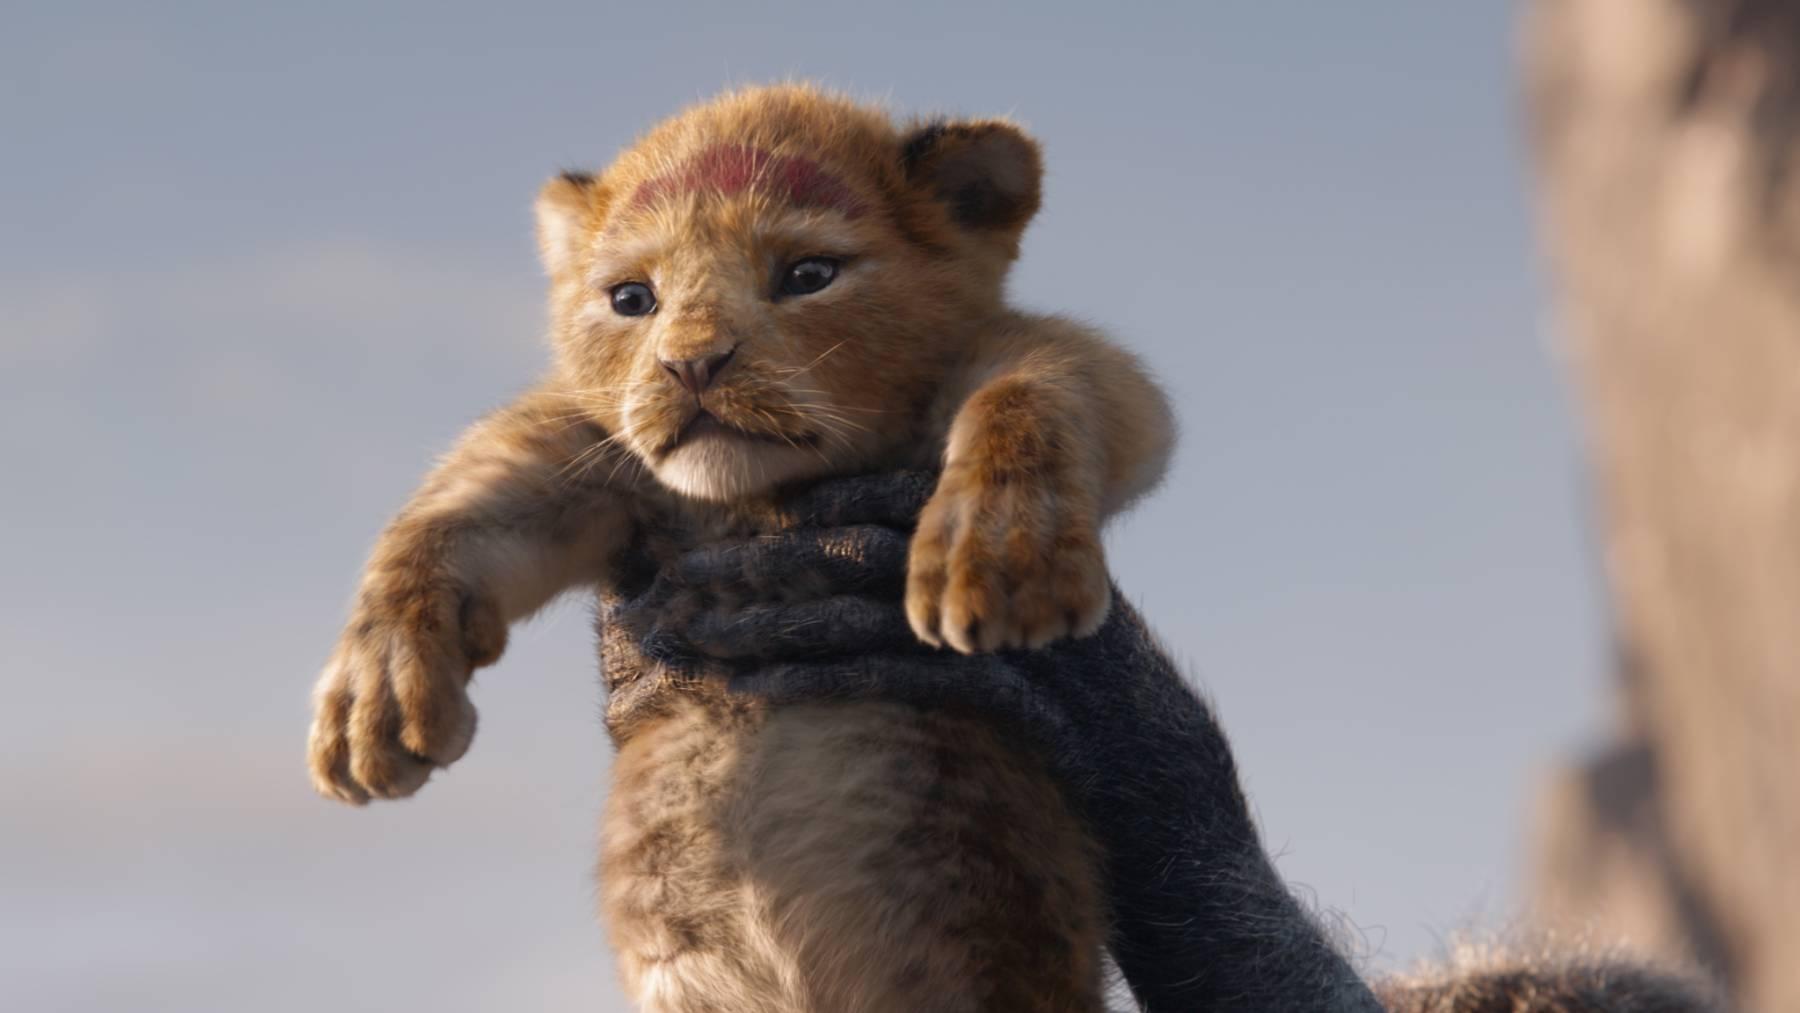 Der König der Löwen_Szenenbild0_print_online_© Disney